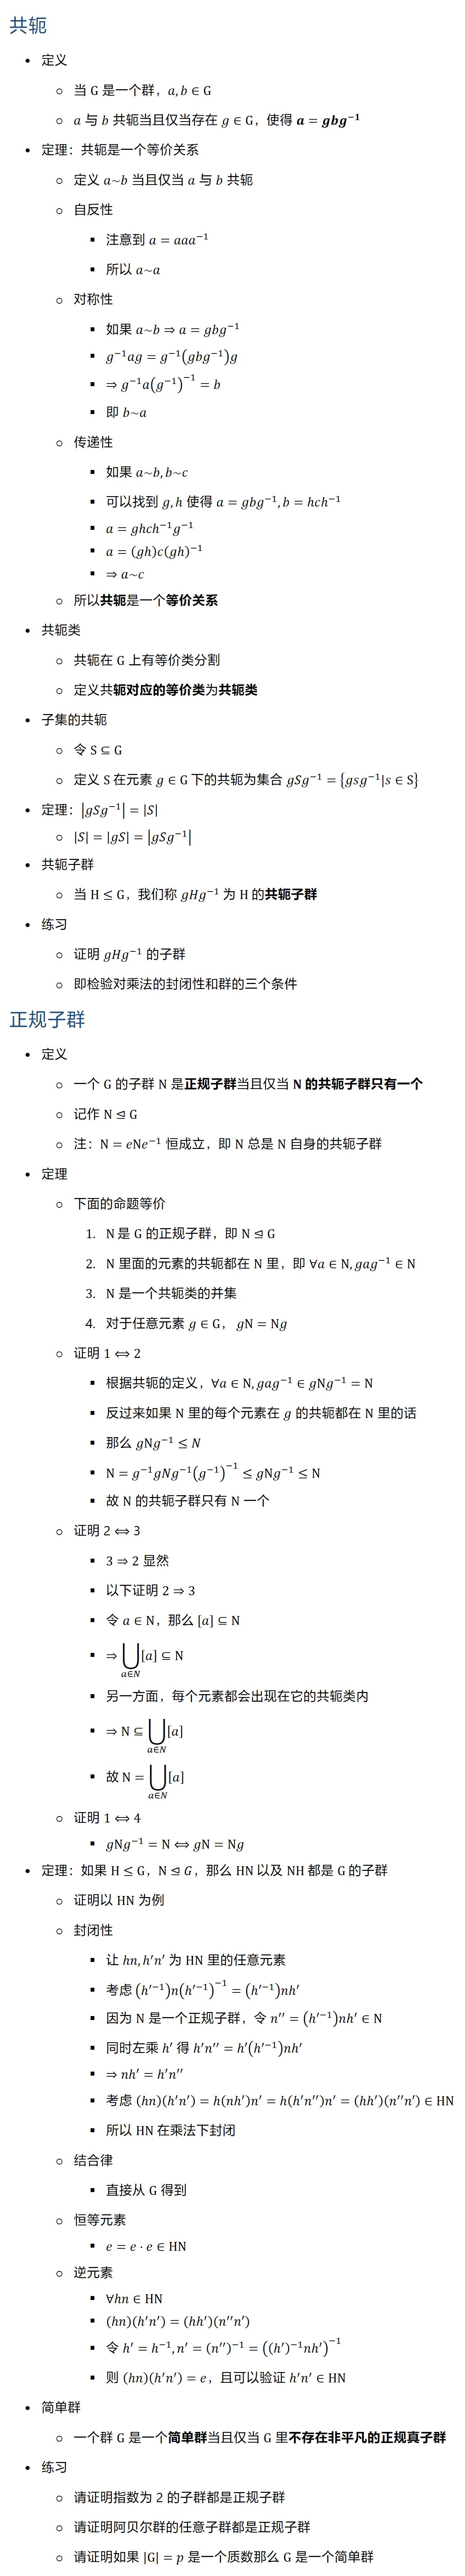 共轭 • 定义 ○ 当 G 是一个群,a,b∈G ○ a 与 b 共轭当且仅当存在 g∈G,使得 a=〖gbg〗^(−1) • 定理:共轭是一个等价关系 ○ 定义 a~b 当且仅当 a 与 b 共轭 ○ 自反性 § 注意到 a=〖aaa〗^(−1) § 所以 a~a ○ 对称性 § 如果 a~b⇒a=〖gbg〗^(−1) § g^(−1) ag=g^(−1) (〖gbg〗^(−1) )g § ⇒g^(−1) a(g^(−1) )^(−1)=b § 即 b~a ○ 传递性 § 如果 a~b, b~c § 可以找到 g,h 使得 a=〖gbg〗^(−1), b=hch(−1) § a=〖gh�h^(−1) g^(−1) § a=(ghc(gh^(−1) § ⇒a~c ○ 所以共轭是一个等价关系 • 共轭类 ○ 共轭在 G 上有等价类分割 ○ 定义共轭对应的等价类为共轭类 • 子集的共轭 ○ 令 S⊆G ○ 定义 S 在元素 g∈G 下的共轭为集合 〖gSg〗^(−1)={gsg^(−1) |s∈S} • 定理:|gSg^(−1) |=|S| ○ |S|=|gS|=|gSg^(−1) | • 共轭子群 ○ 当 H≤G,我们称 〖gHg〗^(−1) 为 H 的共轭子群 • 练习 ○ 证明 〖gHg〗^(−1) 的子群 ○ 即检验对乘法的封闭性和群的三个条件 正规子群 • 定义 ○ 一个 G 的子群 N 是正规子群当且仅当 N 的共轭子群只有一个 ○ 记作 N⊴G ○ 注:N=〖eNe〗^(−1) 恒成立,即 N 总是 N 自身的共轭子群 • 定理 ○ 下面的命题等价 1. N 是 G 的正规子群,即 N⊴G 2. N 里面的元素的共轭都在 N 里,即 ∀a∈N, 〖gag〗^(−1)∈N 3. N 是一个共轭类的并集 4. 对于任意元素 g∈G, gN=Ng ○ 证明 1⟺2 § 根据共轭的定义,∀a∈N, 〖gag〗^(−1)∈gNg^(−1)=N § 反过来如果 N 里的每个元素在 g 的共轭都在 N 里的话 § 那么 〖gNg〗^(−1)≤N § N=g^(−1) 〖gNg〗^(−1) (g^(−1) )^(−1)≤〖gNg〗^(−1)≤N § 故 N 的共轭子群只有 N 一个 ○ 证明 2⟺3 § 3⇒2 显然 § 以下证明 2⇒3 § 令 a∈N,那么 [a]⊆N § ⇒⋃8_(a∈N)▒[a] ⊆N § 另一方面,每个元素都会出现在它的共轭类内 § ⇒N⊆⋃8_(a∈N)▒[a] § 故 N=⋃8_(a∈N)▒[a] ○ 证明 1⟺4 § 〖gNg〗^(−1)=N⟺gN=Ng • 定理:如果 H≤G,N⊴G,那么 HN 以及 NH 都是 G 的子群 ○ 证明以 HN 为例 ○ 封闭性 § 让 hn, h′ n′ 为 HN 里的任意元素 § 考虑 (h(′−1) )n(h(′−1) )^(−1)=(h(′−1) )nh′ § 因为 N 是一个正规子群,令 n^′′=(h(′−1) )nh′∈N § 同时左乘 h′ 得 h′ n^′′=h′(h(′−1) )nh′ § ⇒〖nh^′=h′ n^′′ § 考虑 (h�)(h′ n^′ )=h(nh′ ) n^′=h(h′ n^′′ ) n^′=(h^′ )(n^′′ n′)∈HN § 所以 HN 在乘法下封闭 ○ 结合律 § 直接从 G 得到 ○ 恒等元素 § e=e⋅e∈HN ○ 逆元素 § ∀hn∈HN § (h�)(h′ n^′ )=(h^′ )(n^′′ n′) § 令 h′=h(−1), n^′=(n^′′ )^(−1)=((h′ )^(−1) nh′ )^(−1) § 则 (h�)(h′ n^′ )=e,且可以验证 h′ n^′∈HN • 简单群 ○ 一个群 G 是一个简单群当且仅当 G 里不存在非平凡的正规真子群 • 练习 ○ 请证明指数为 2 的子群都是正规子群 ○ 请证明阿贝尔群的任意子群都是正规子群 ○ 请证明如果 |G|=p 是一个质数那么 G 是一个简单群